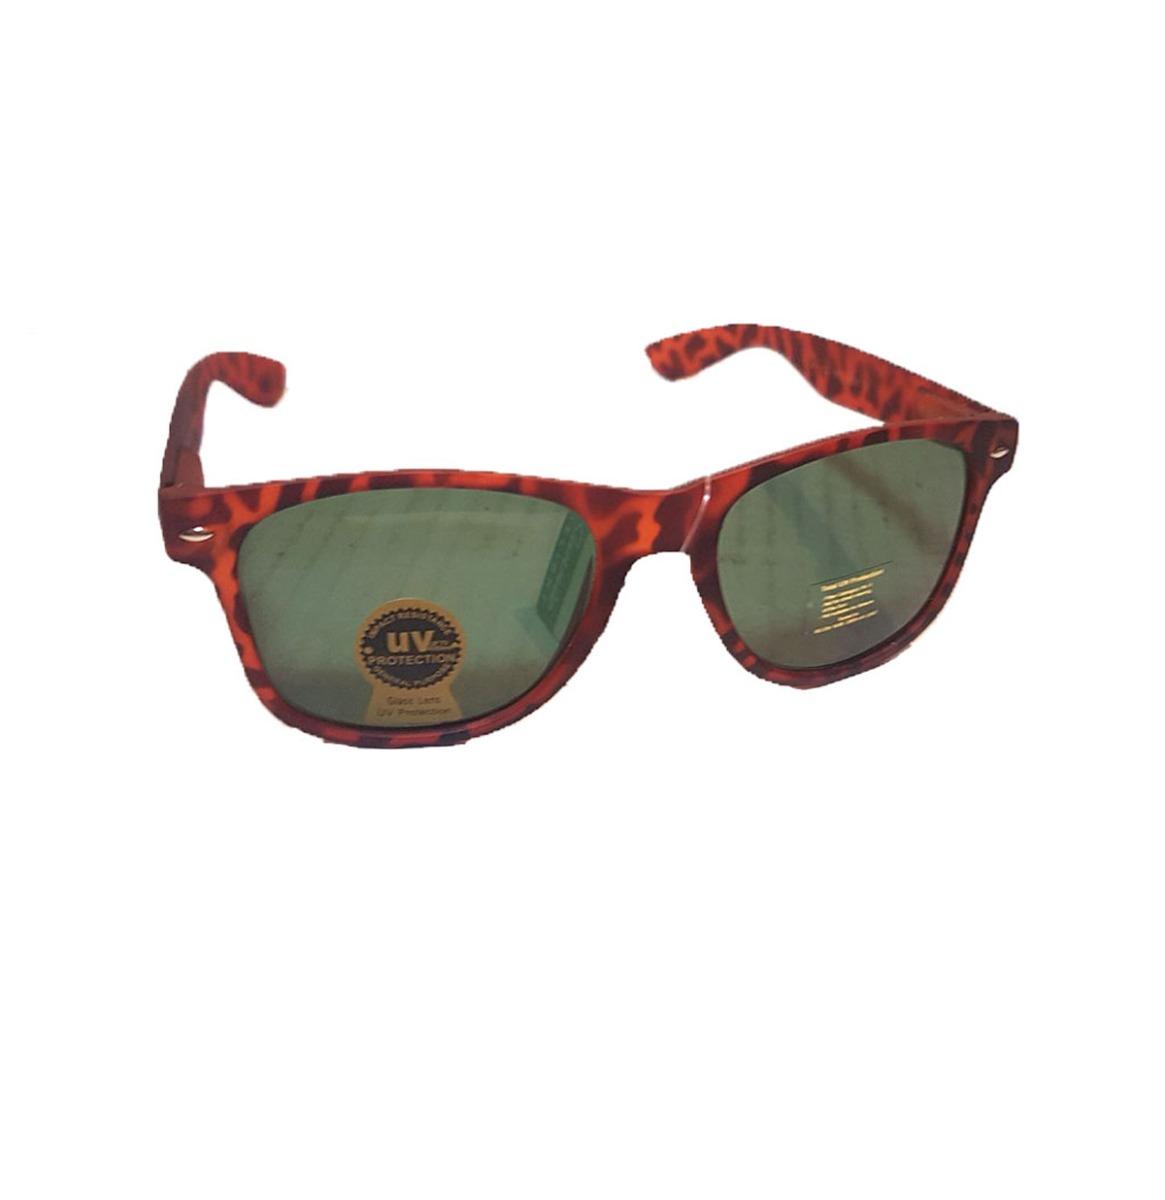 Revive Retro Wayfarer Sunglasses Tortoise Shell